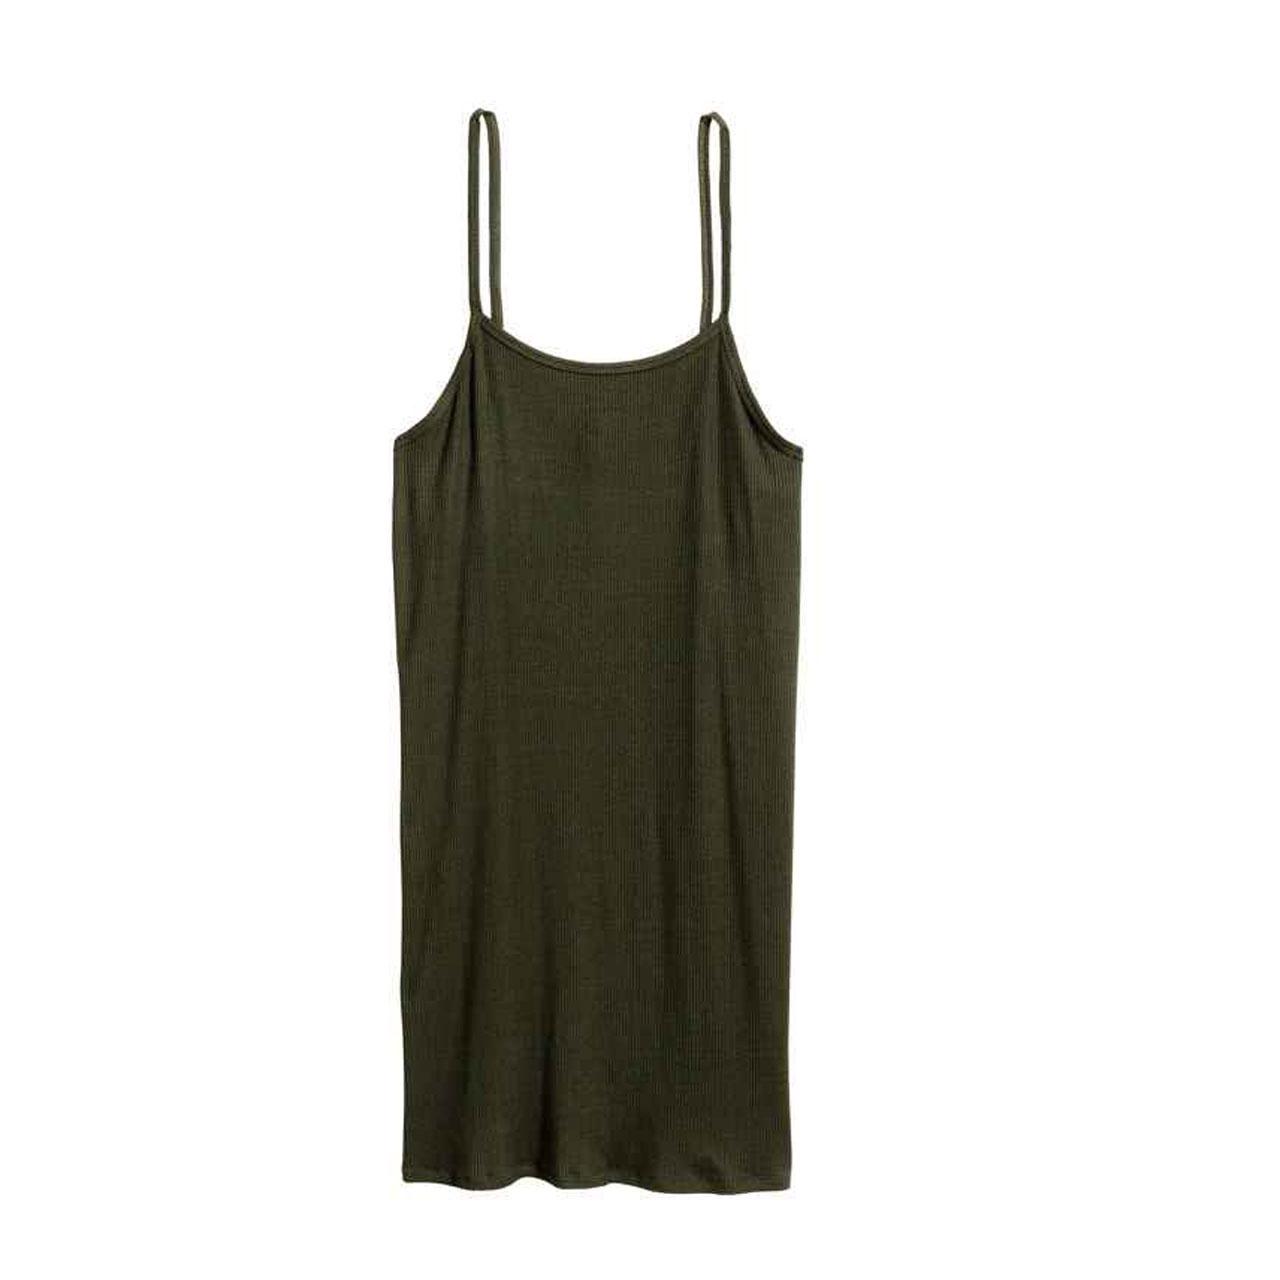 پیراهن زنانه دیوایدد کد f989